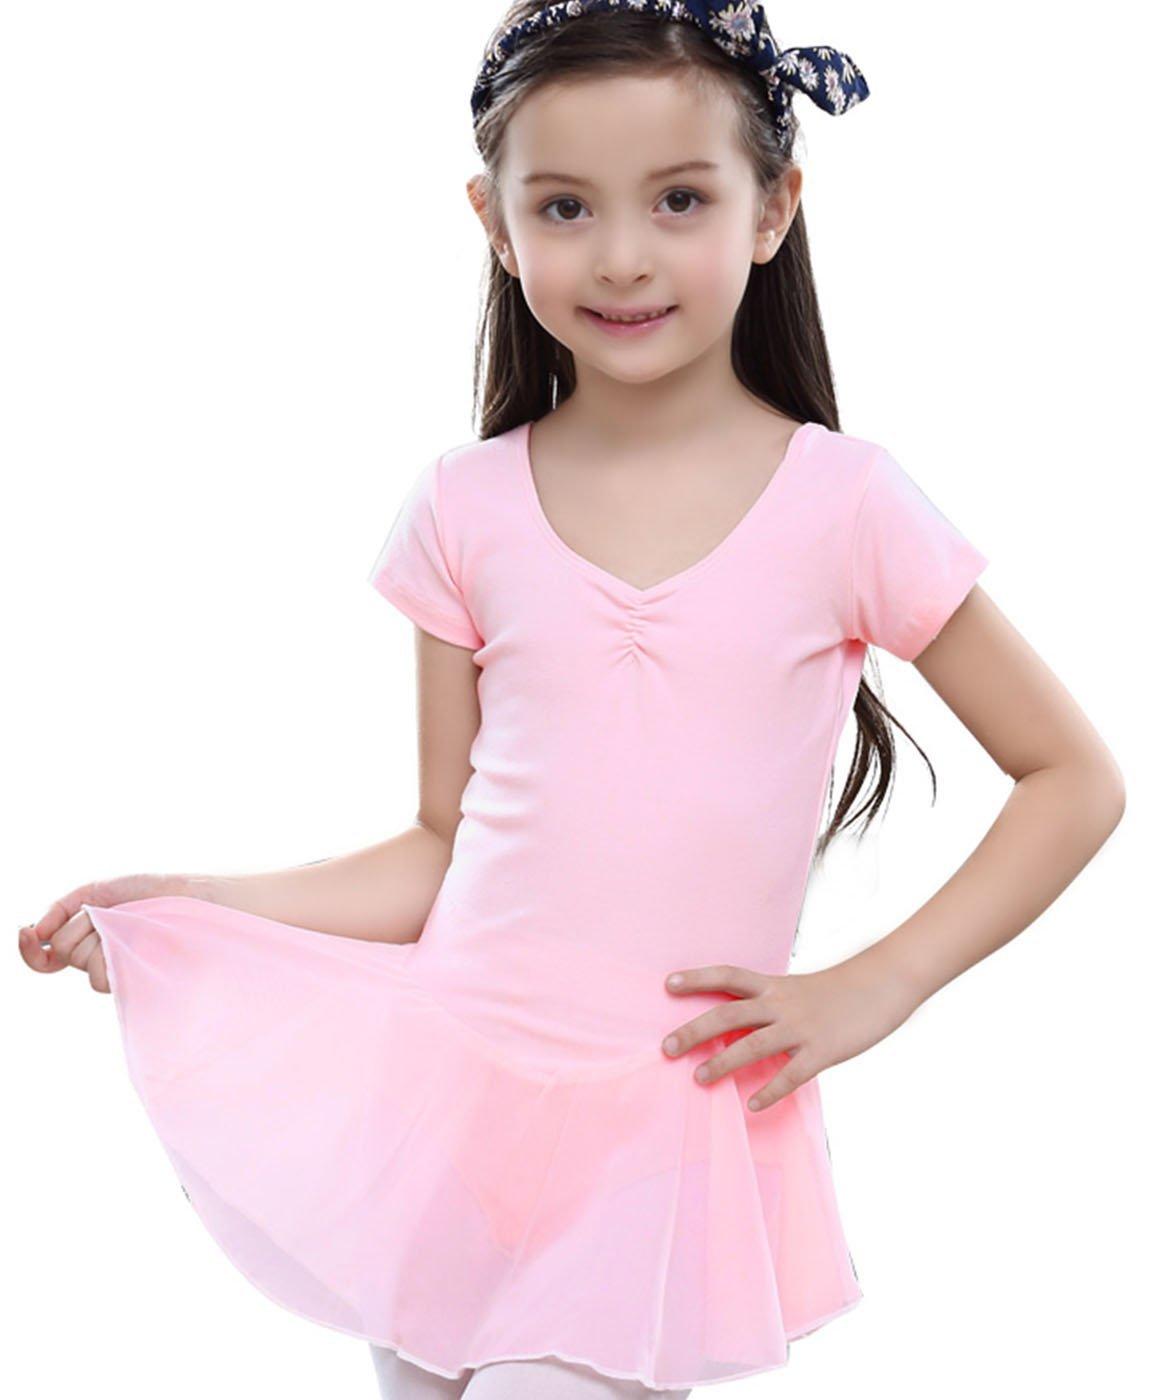 725a89421 Cheap Dancewear Gymnastics